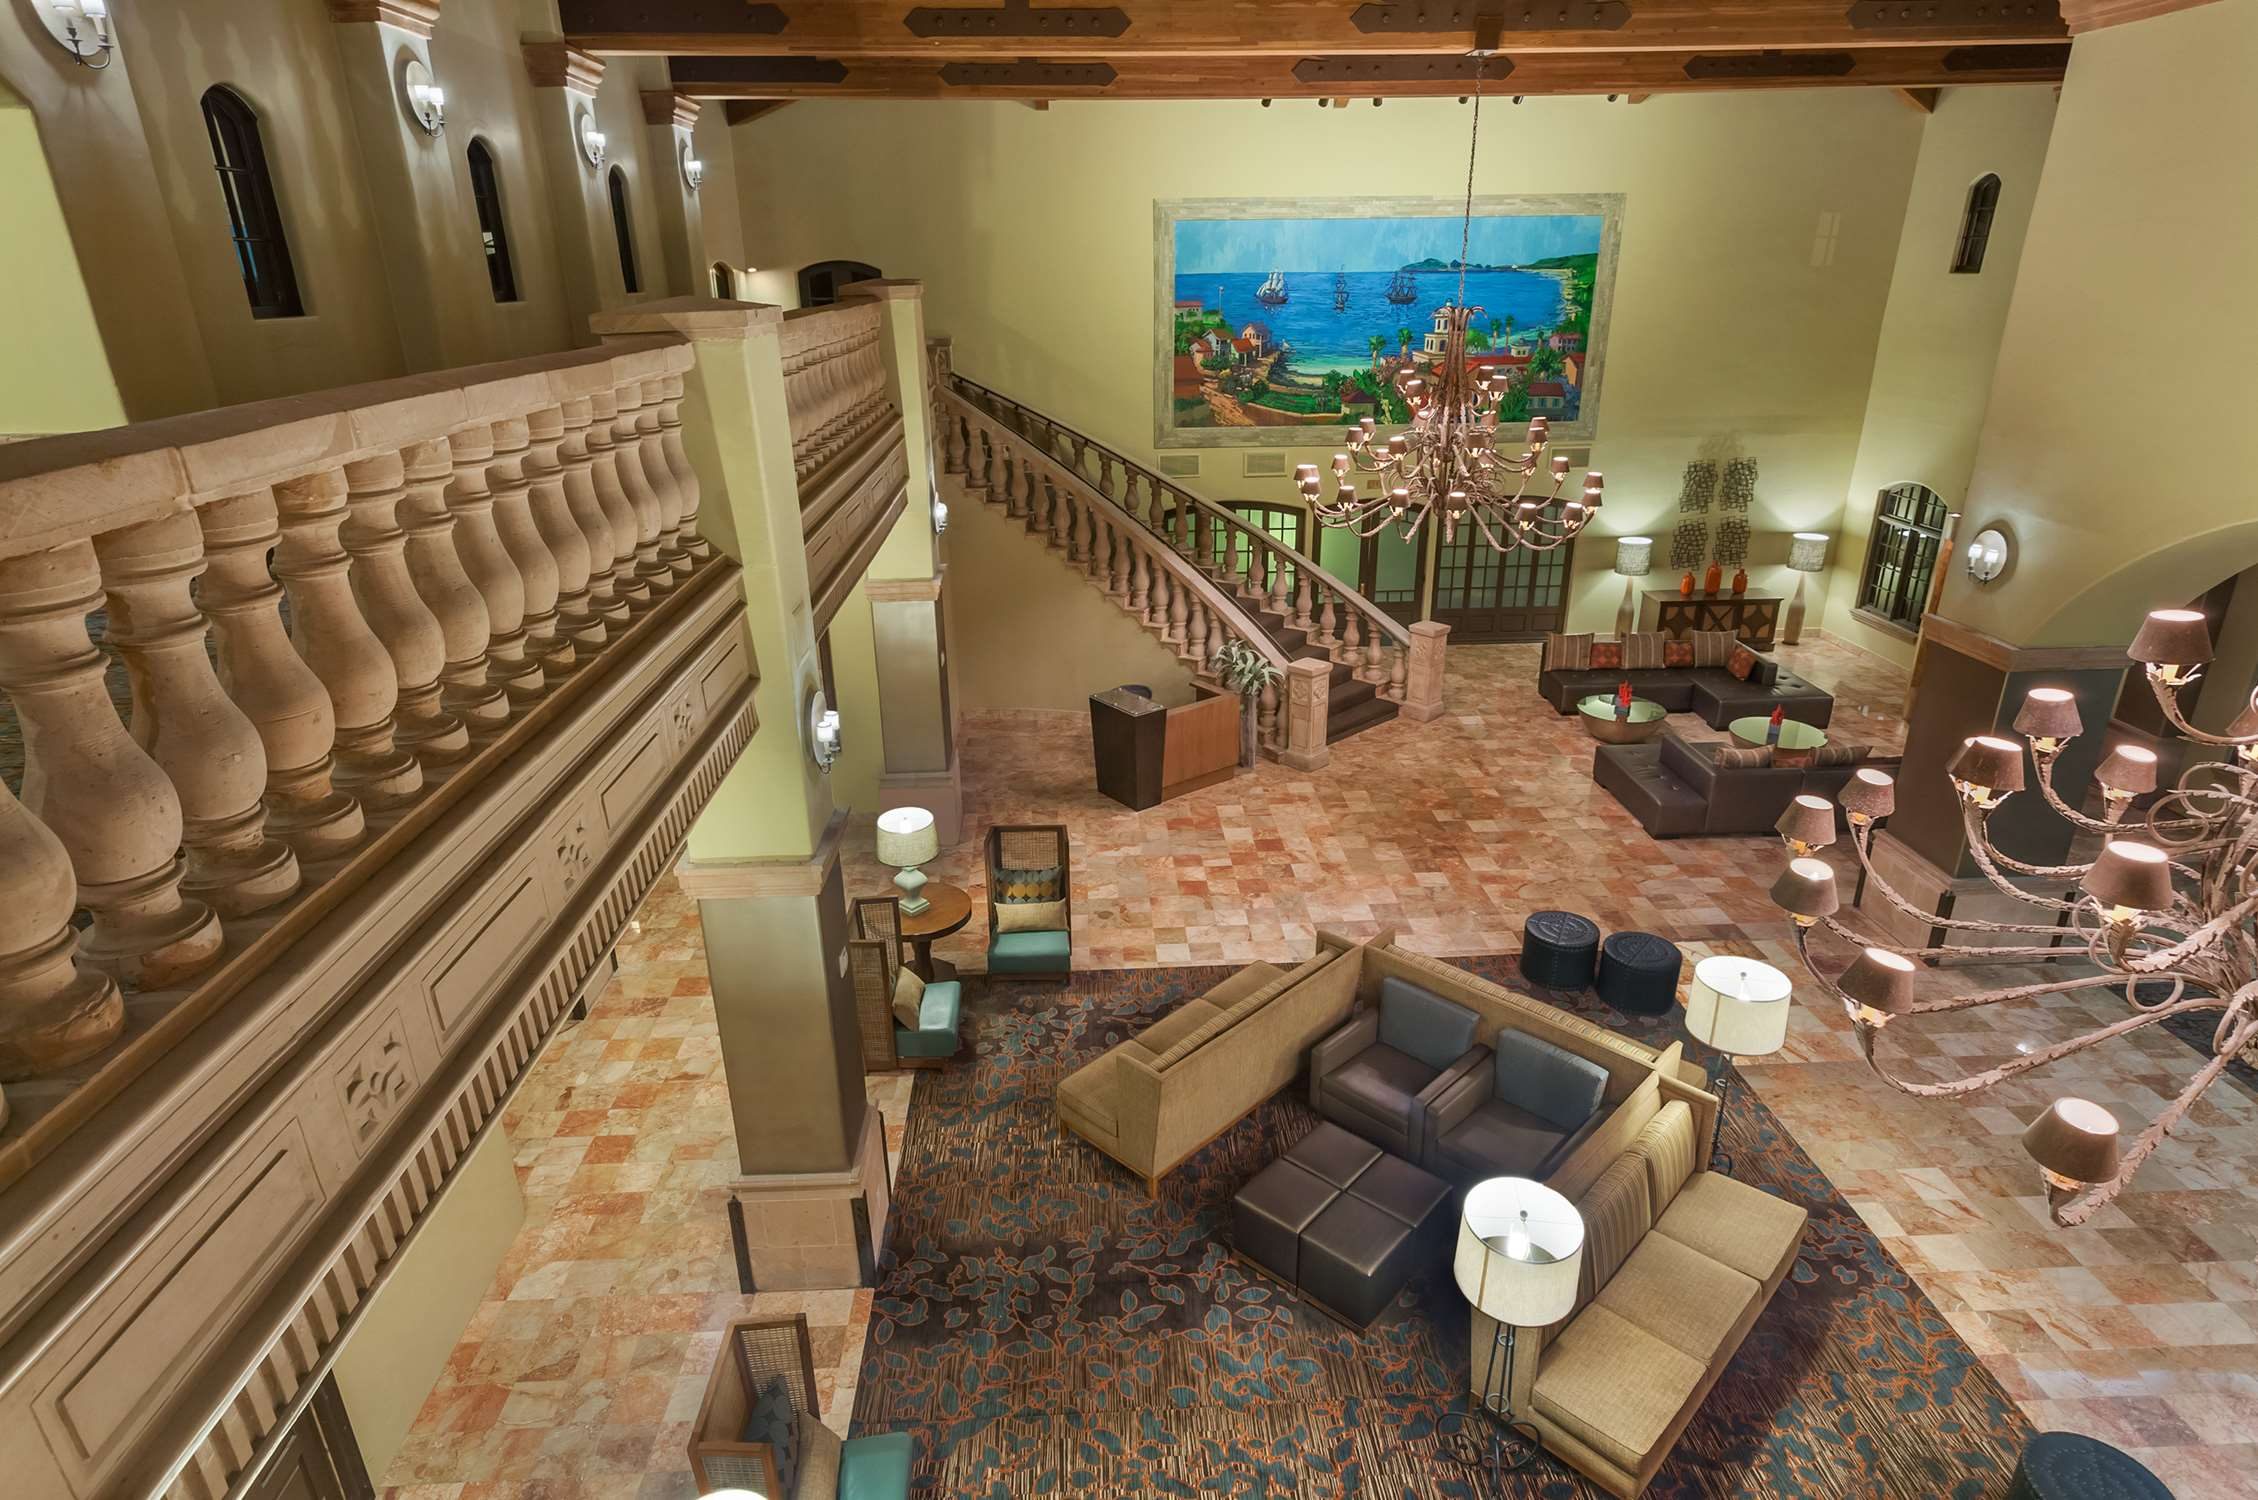 Embassy Suites by Hilton Mandalay Beach Resort